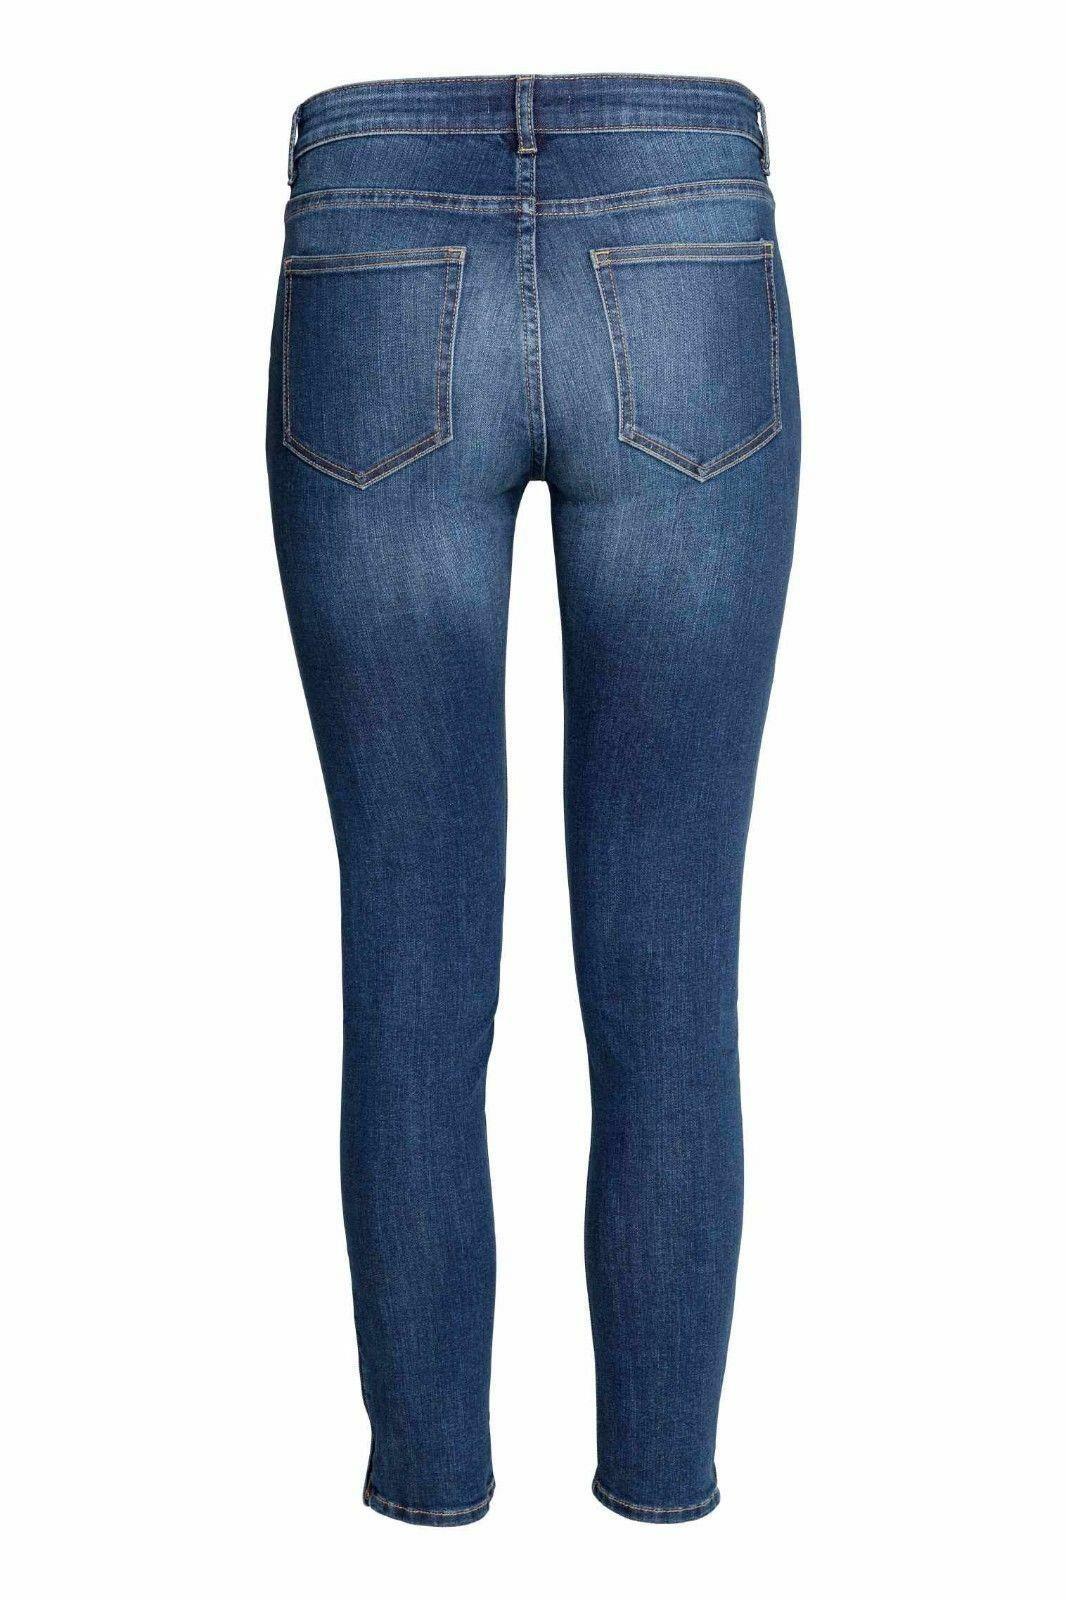 EX-Zara-Ladies-Womans-Jeans-Stretch-Denim-Trousers-Pants-Waist-Sizes-UK-8-18 thumbnail 9